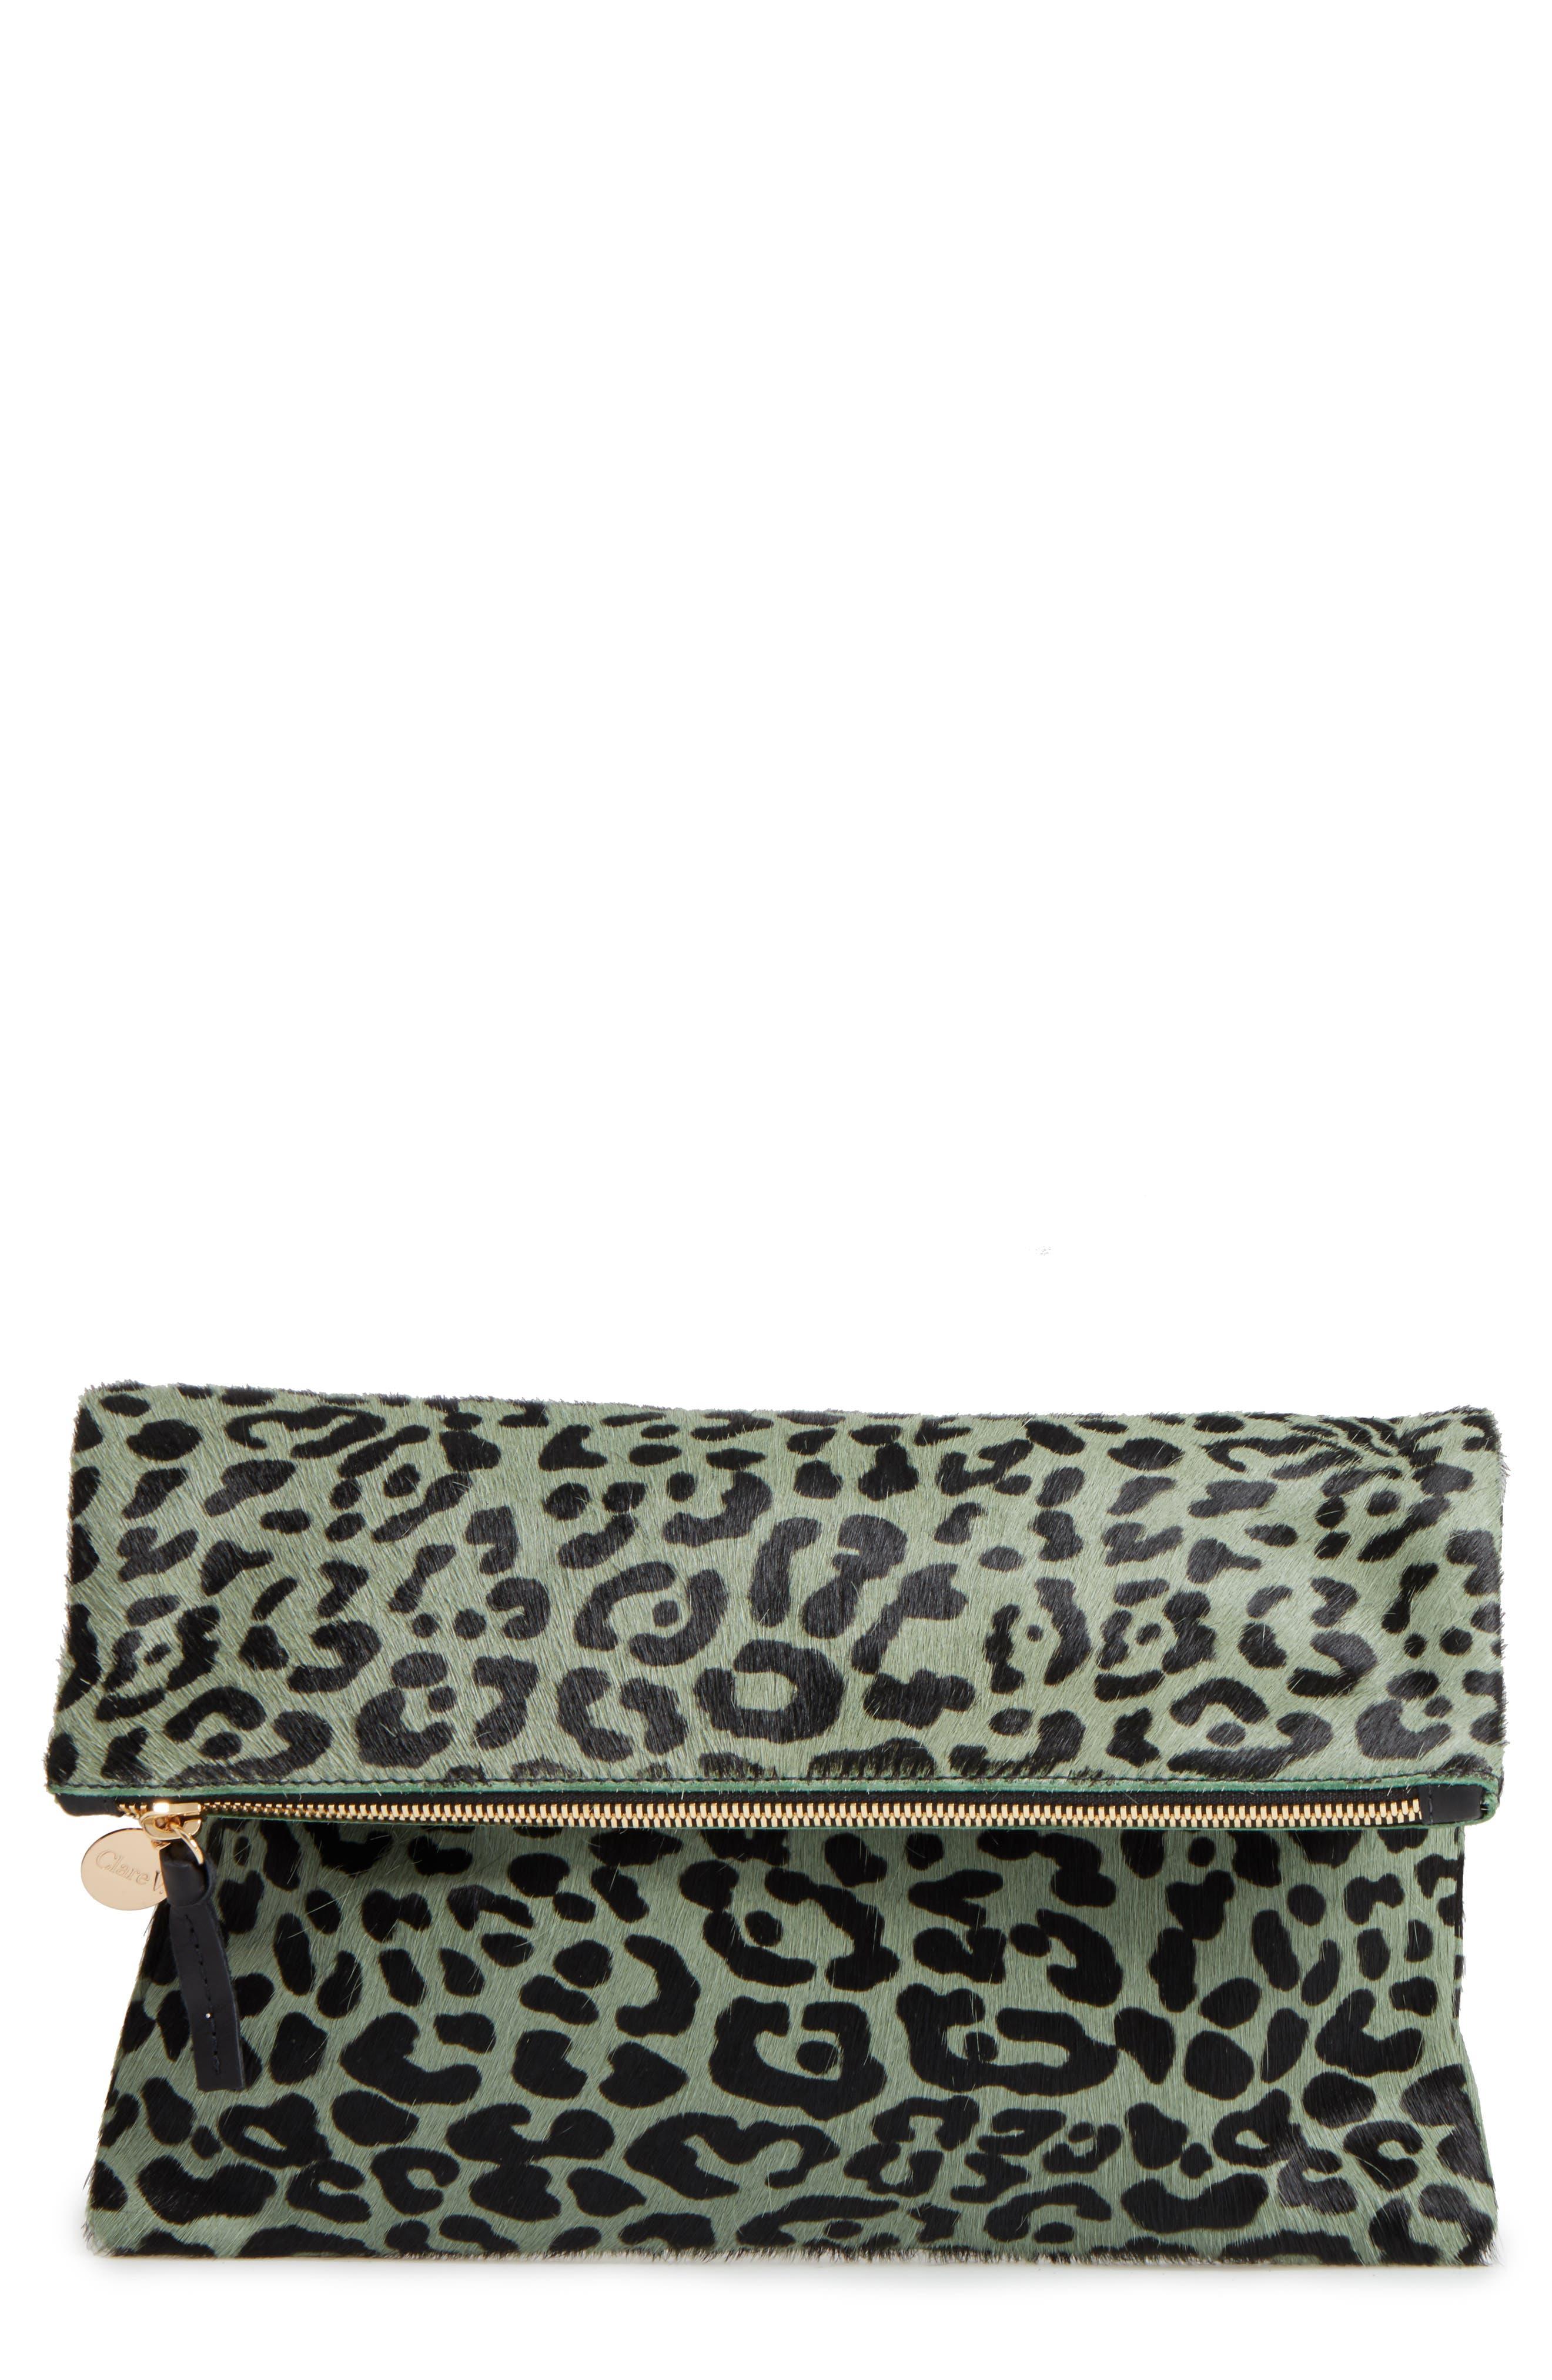 Clare V. Leopard Print Genuine Calf Hair Foldover Clutch